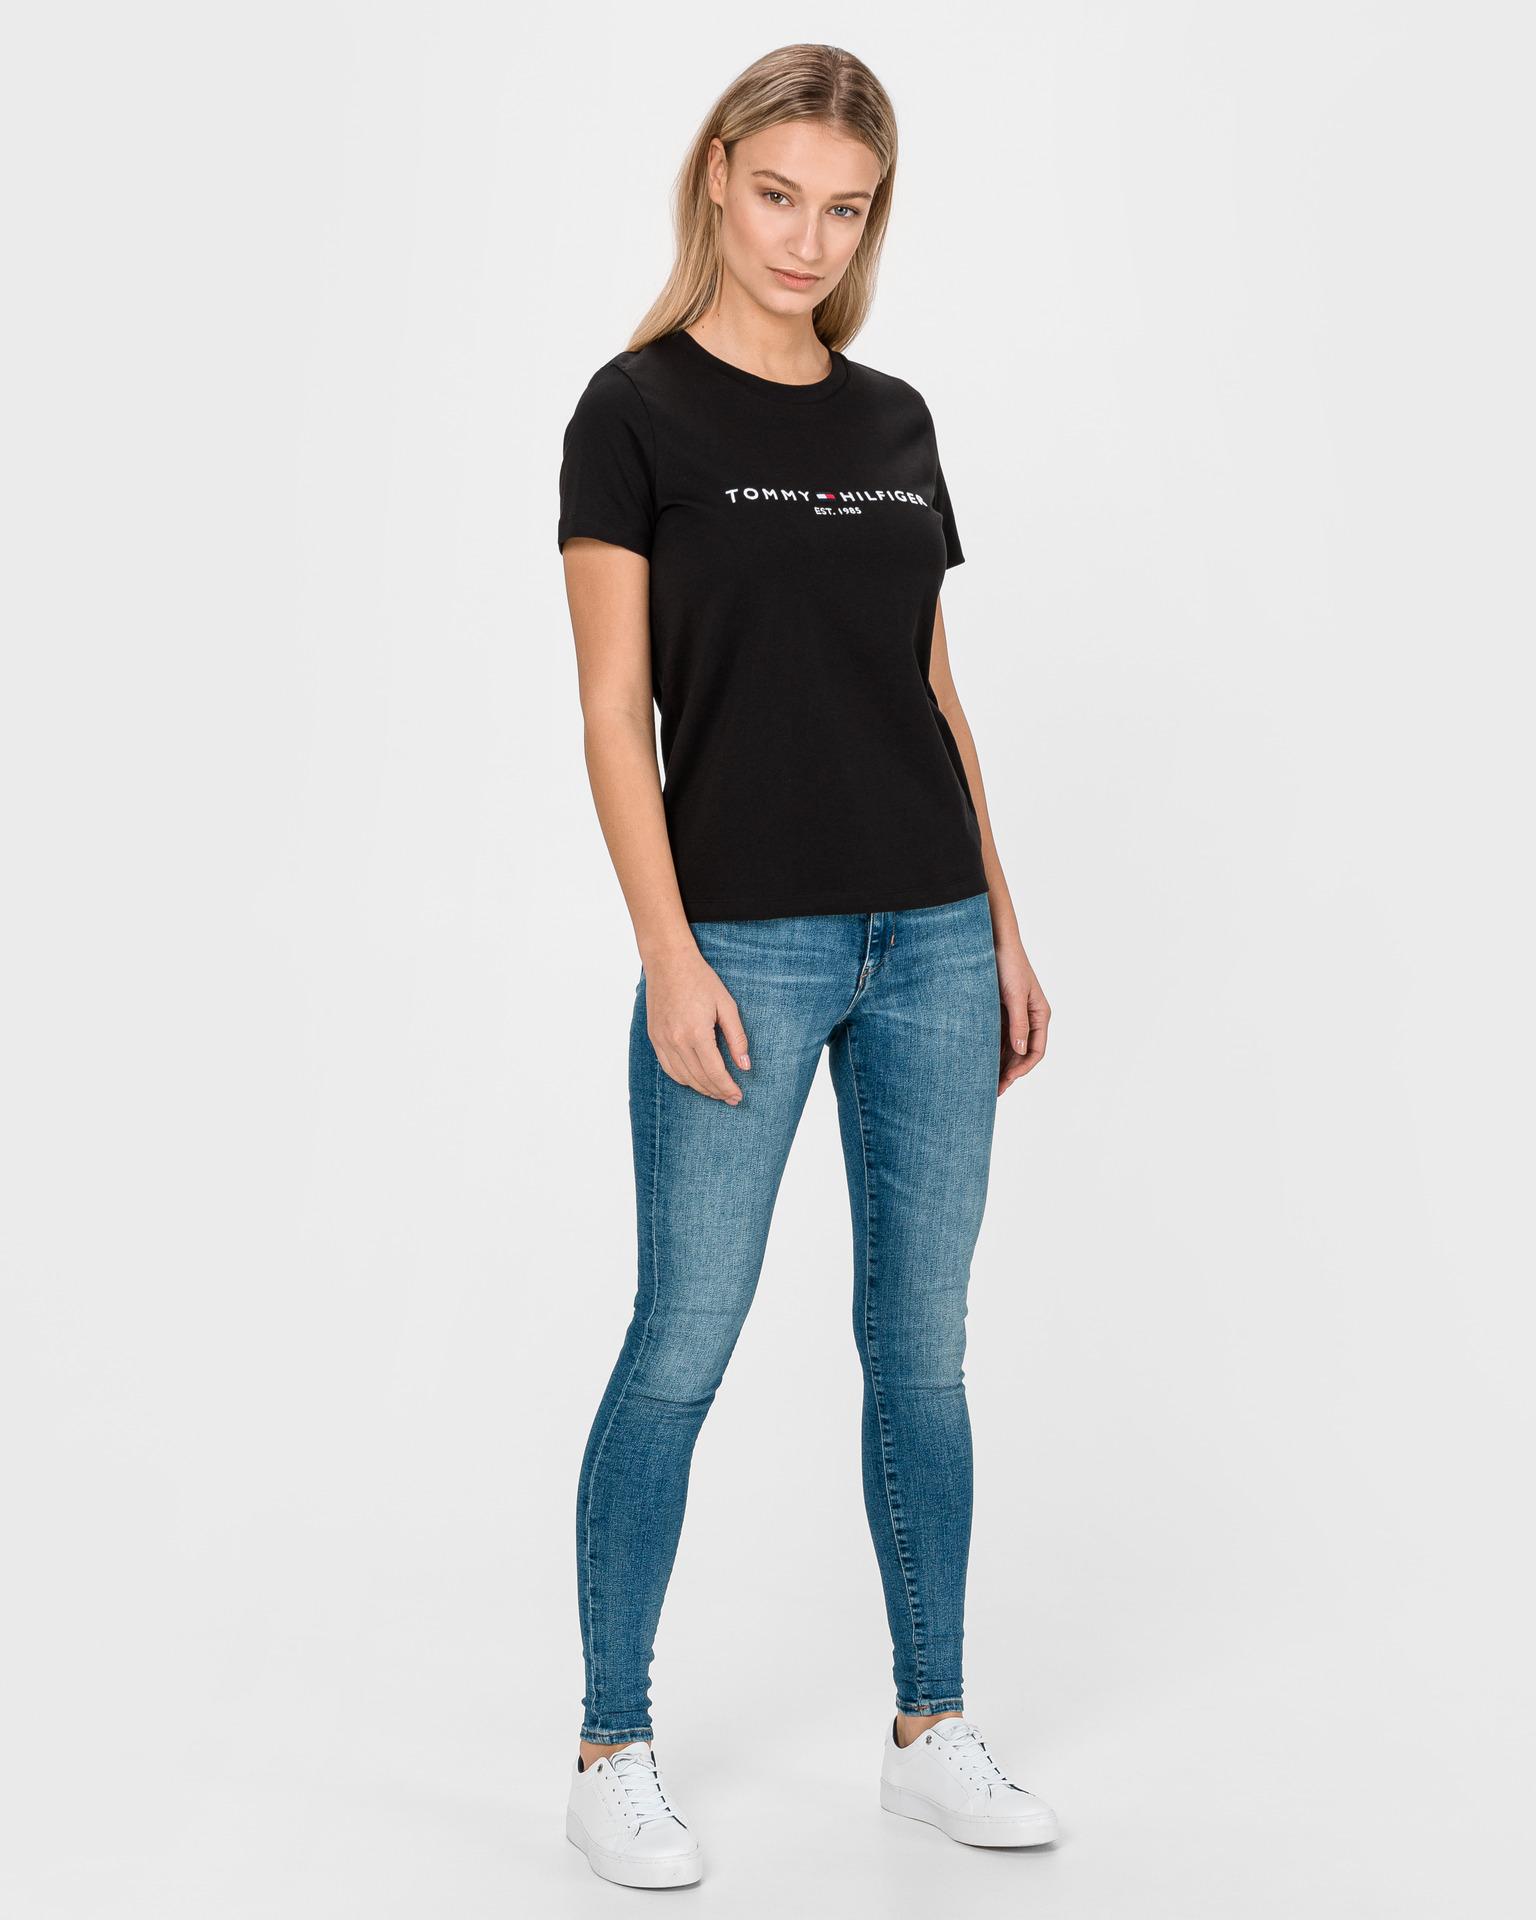 Tommy Hilfiger black women´s T-shirt Essential